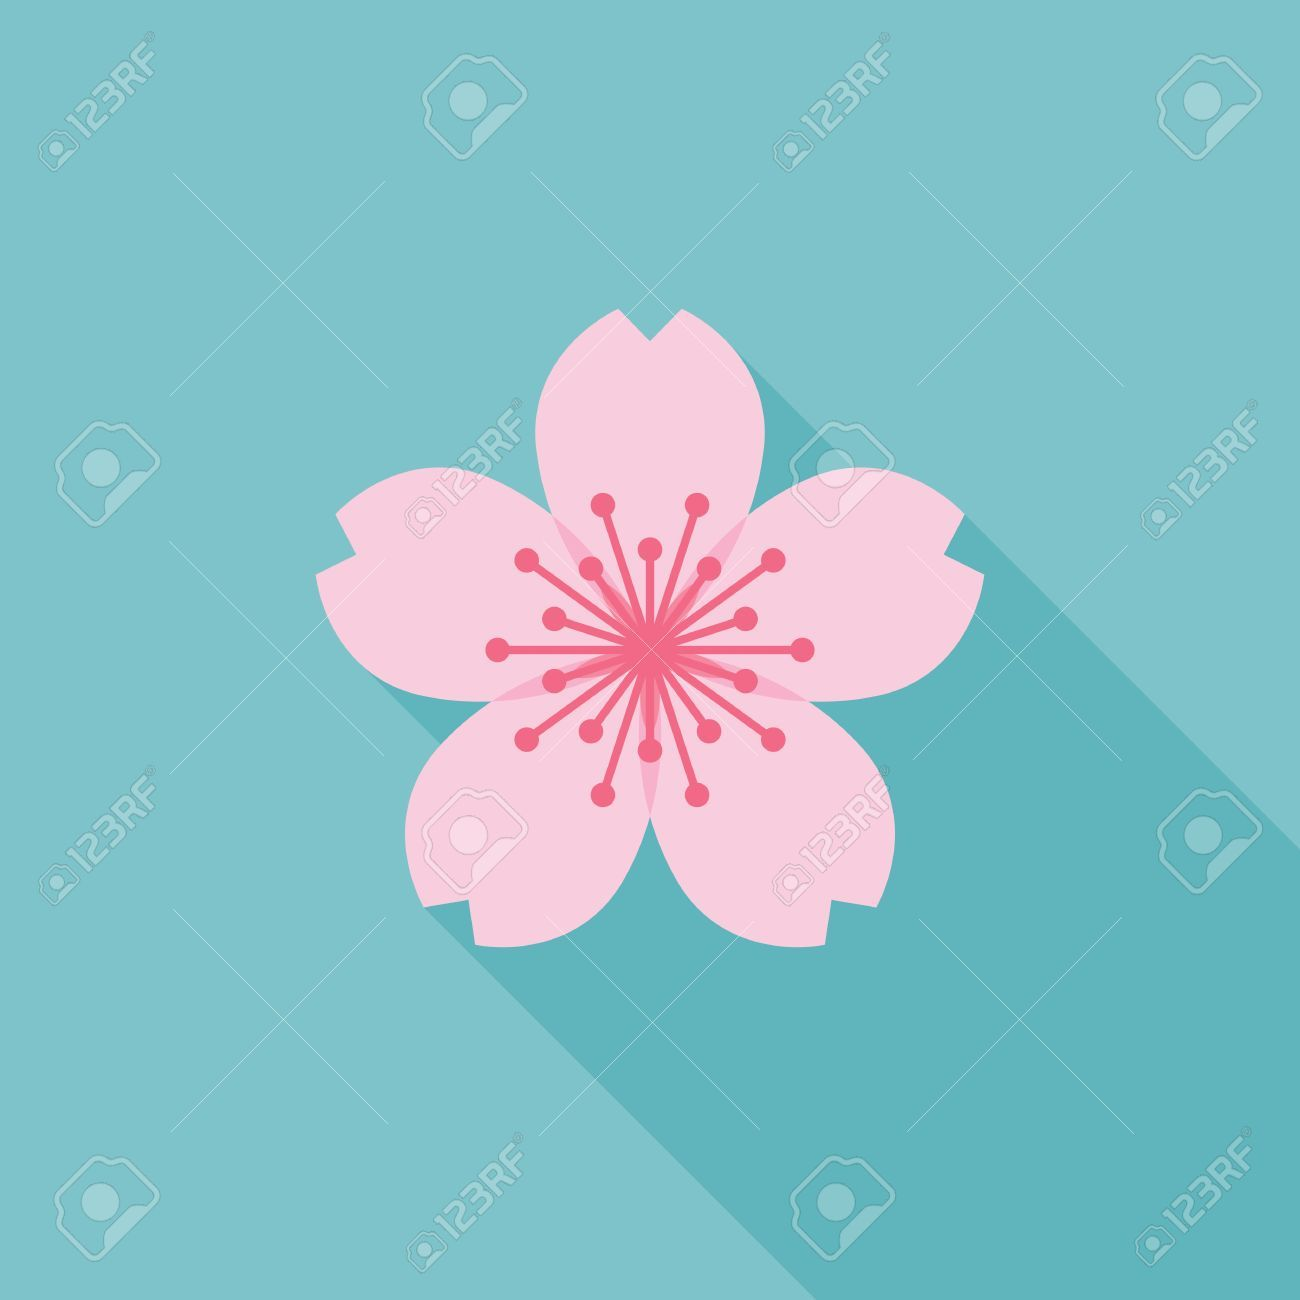 Somei Yoshino Google Search Cherry Blossom Flowers Cherry Blossom Wallpaper Cherry Blossom Symbolism